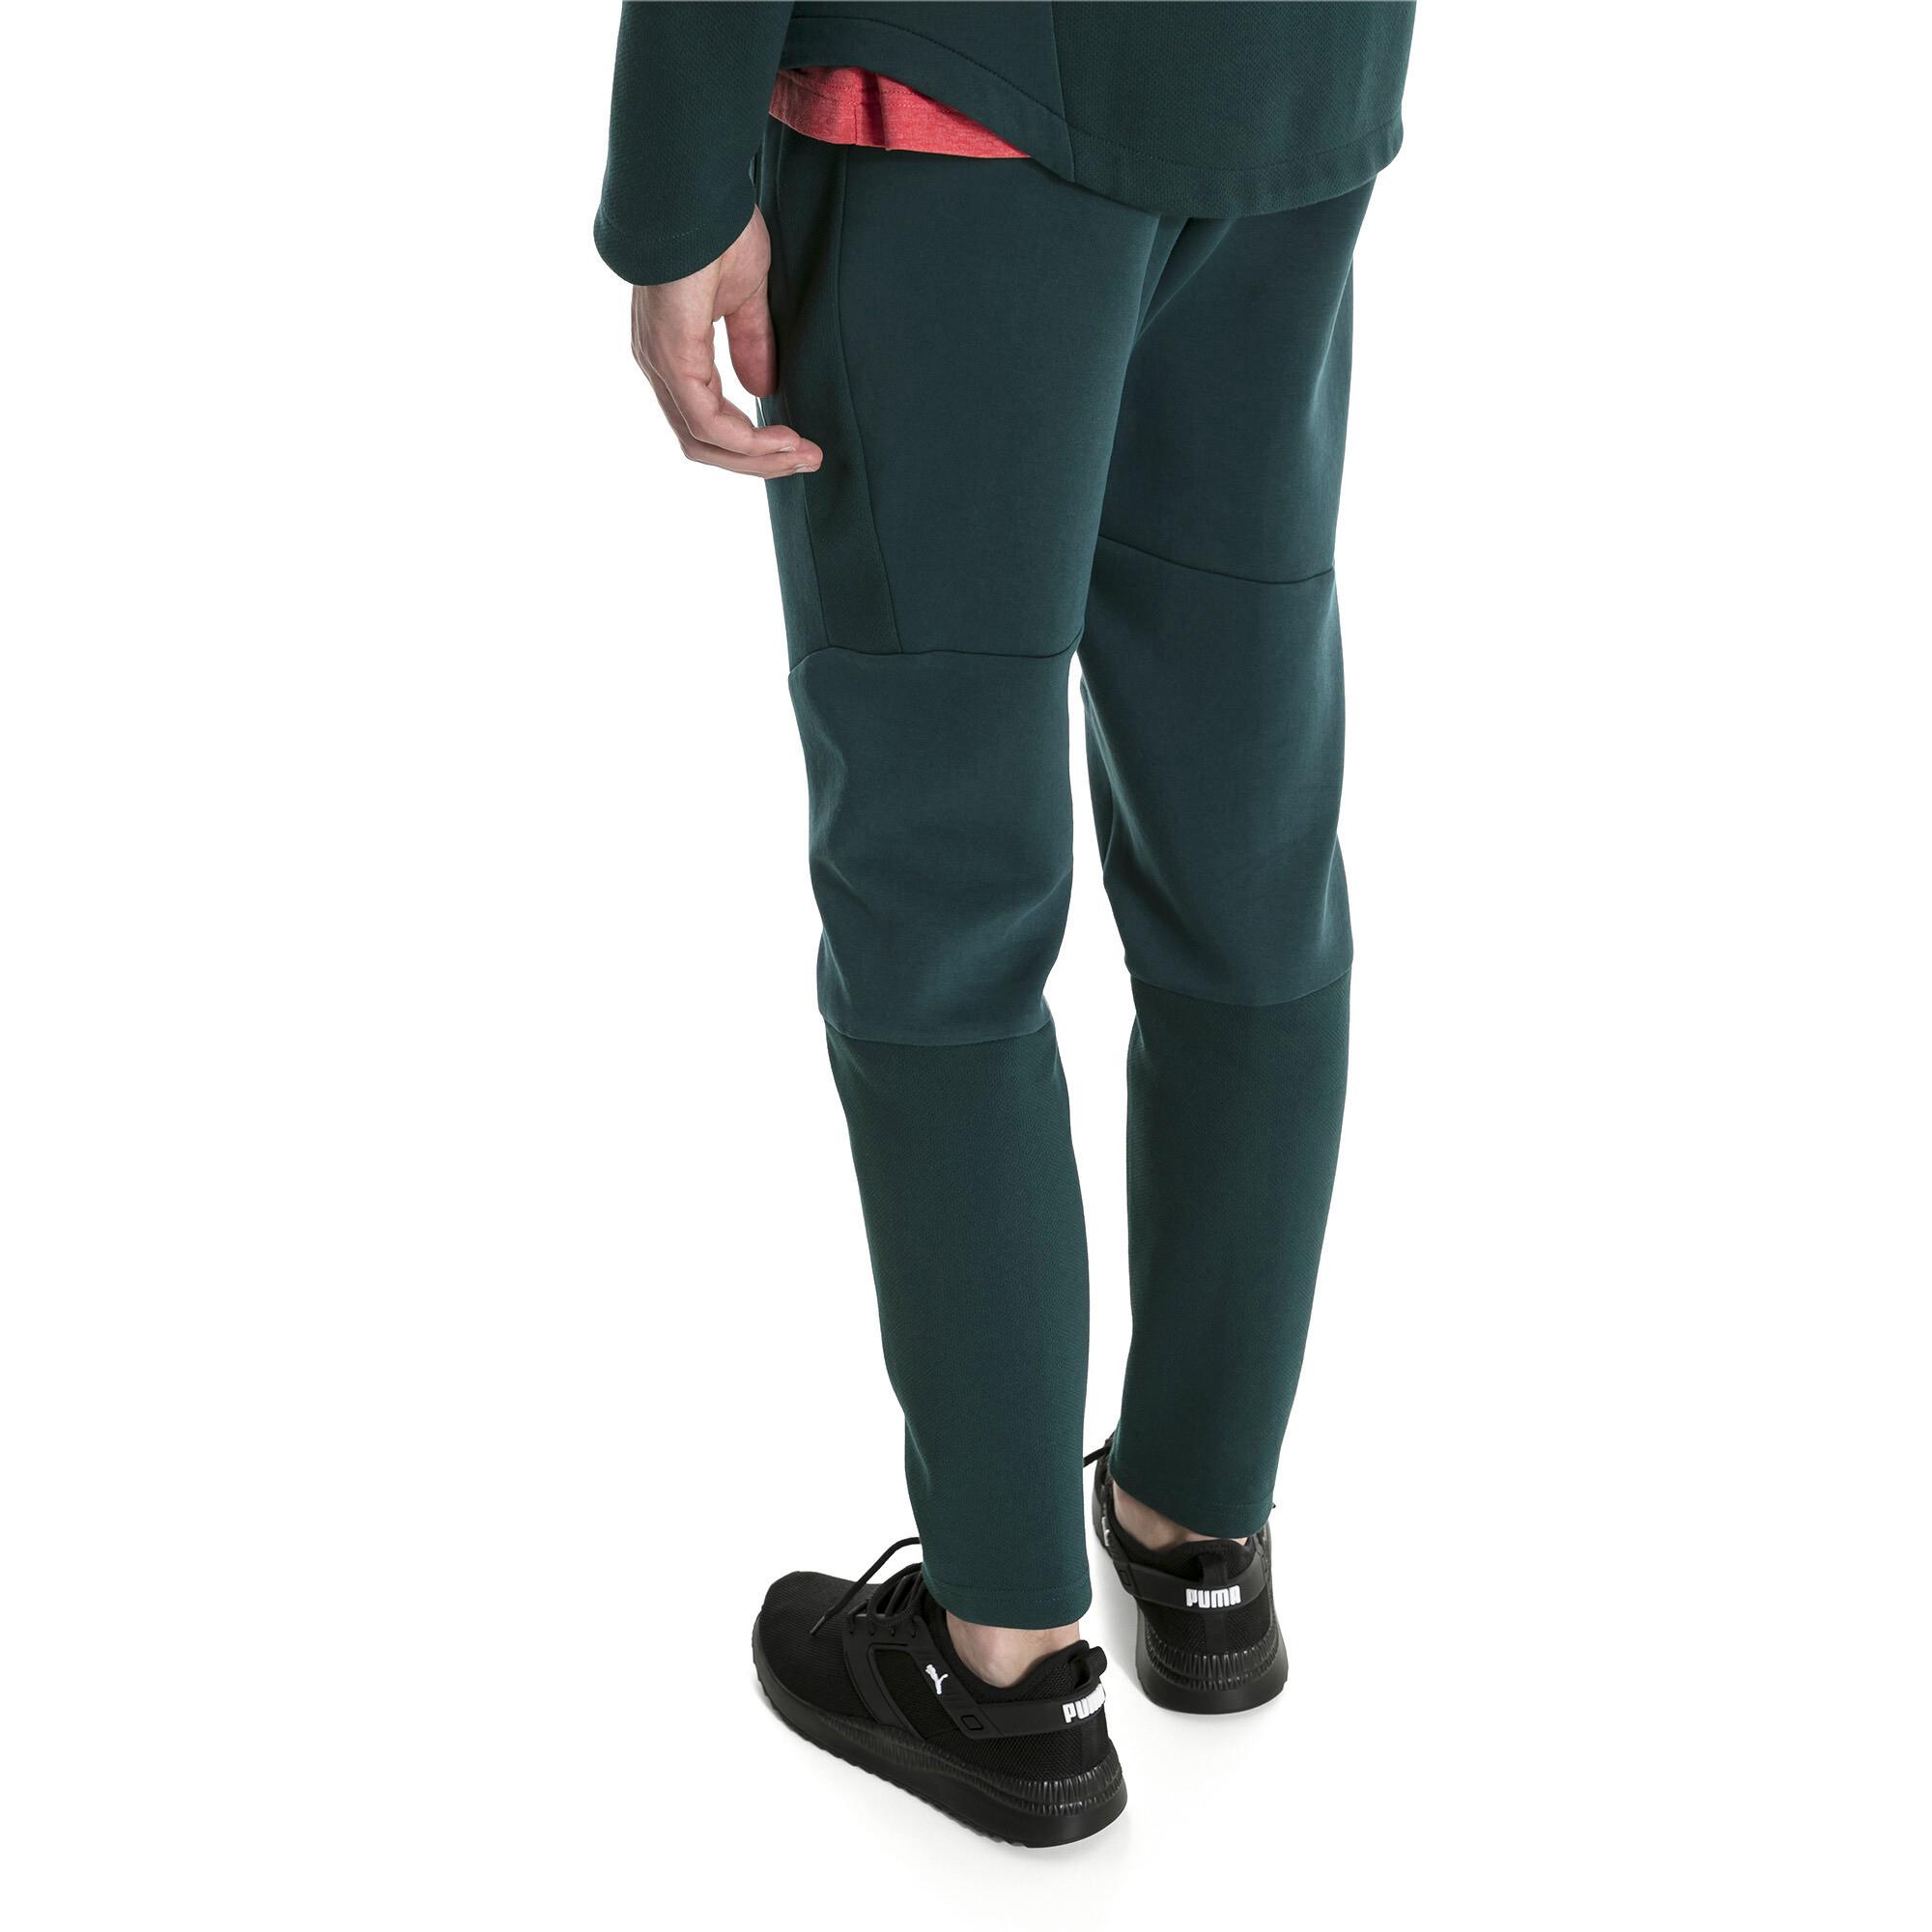 Image Puma Evostripe Move Knitted Men's Pants #2